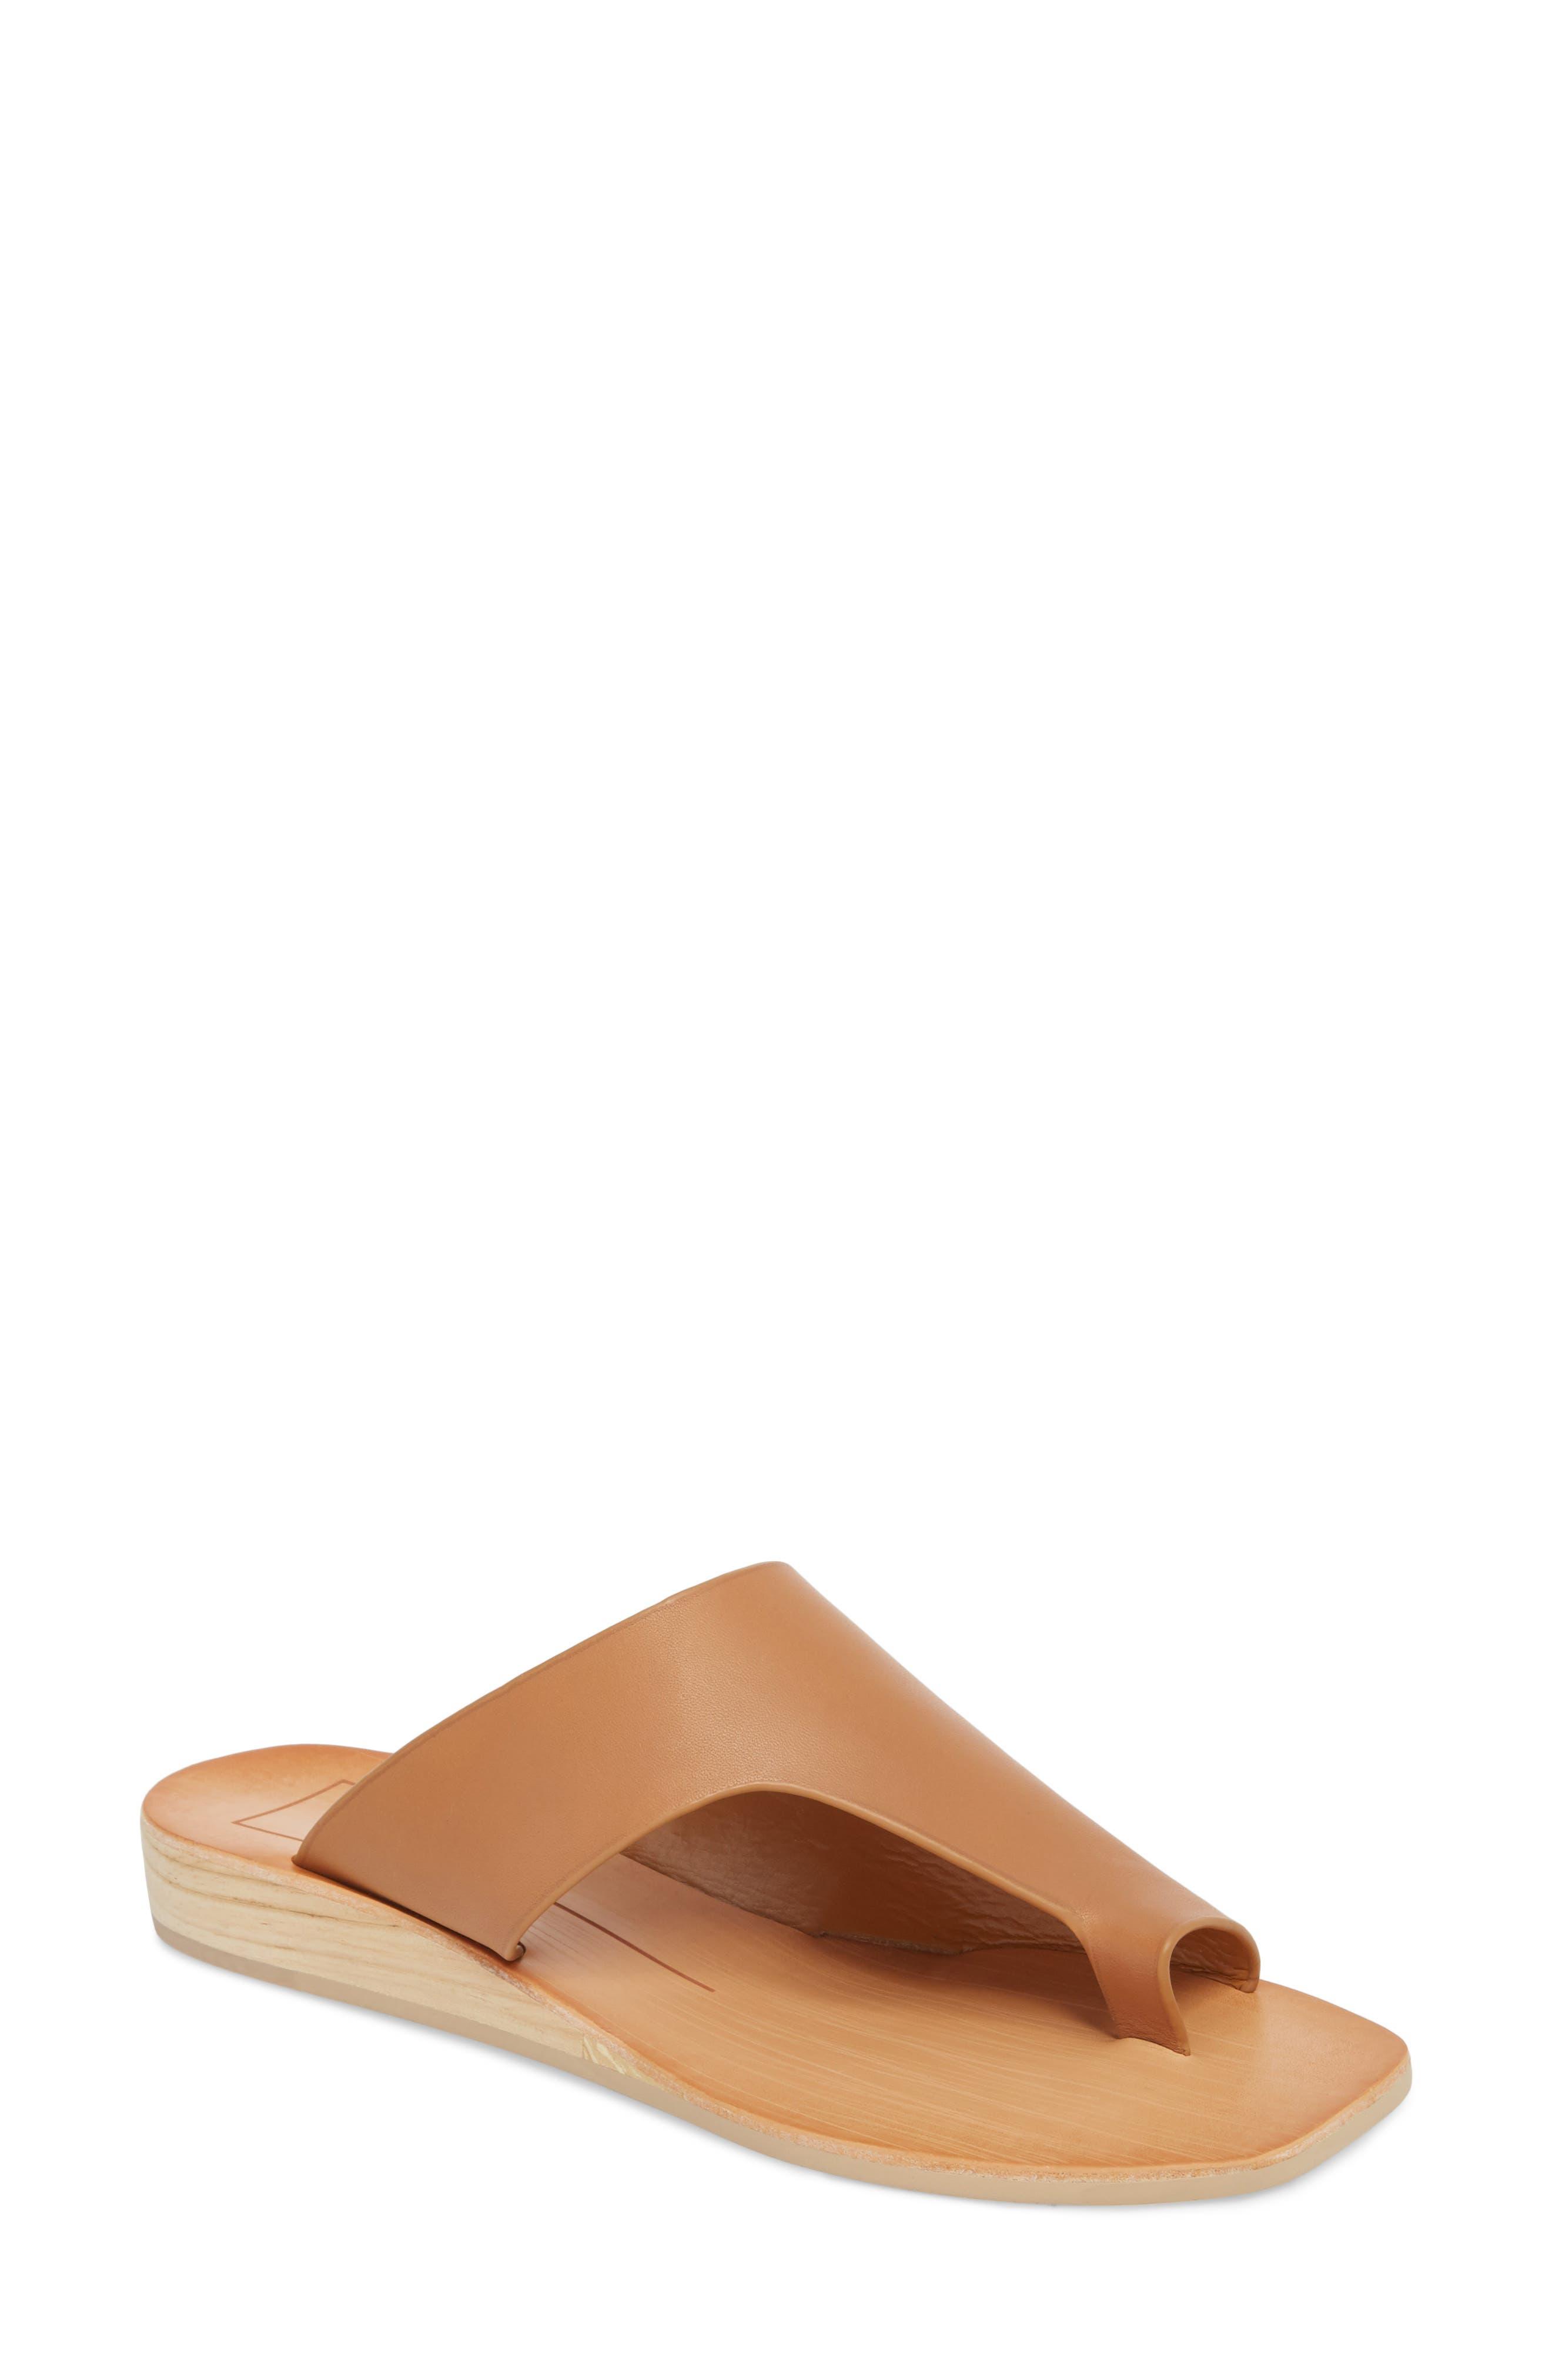 Hazle Asymmetrical Toe Loop Sandal,                             Main thumbnail 1, color,                             Caramel